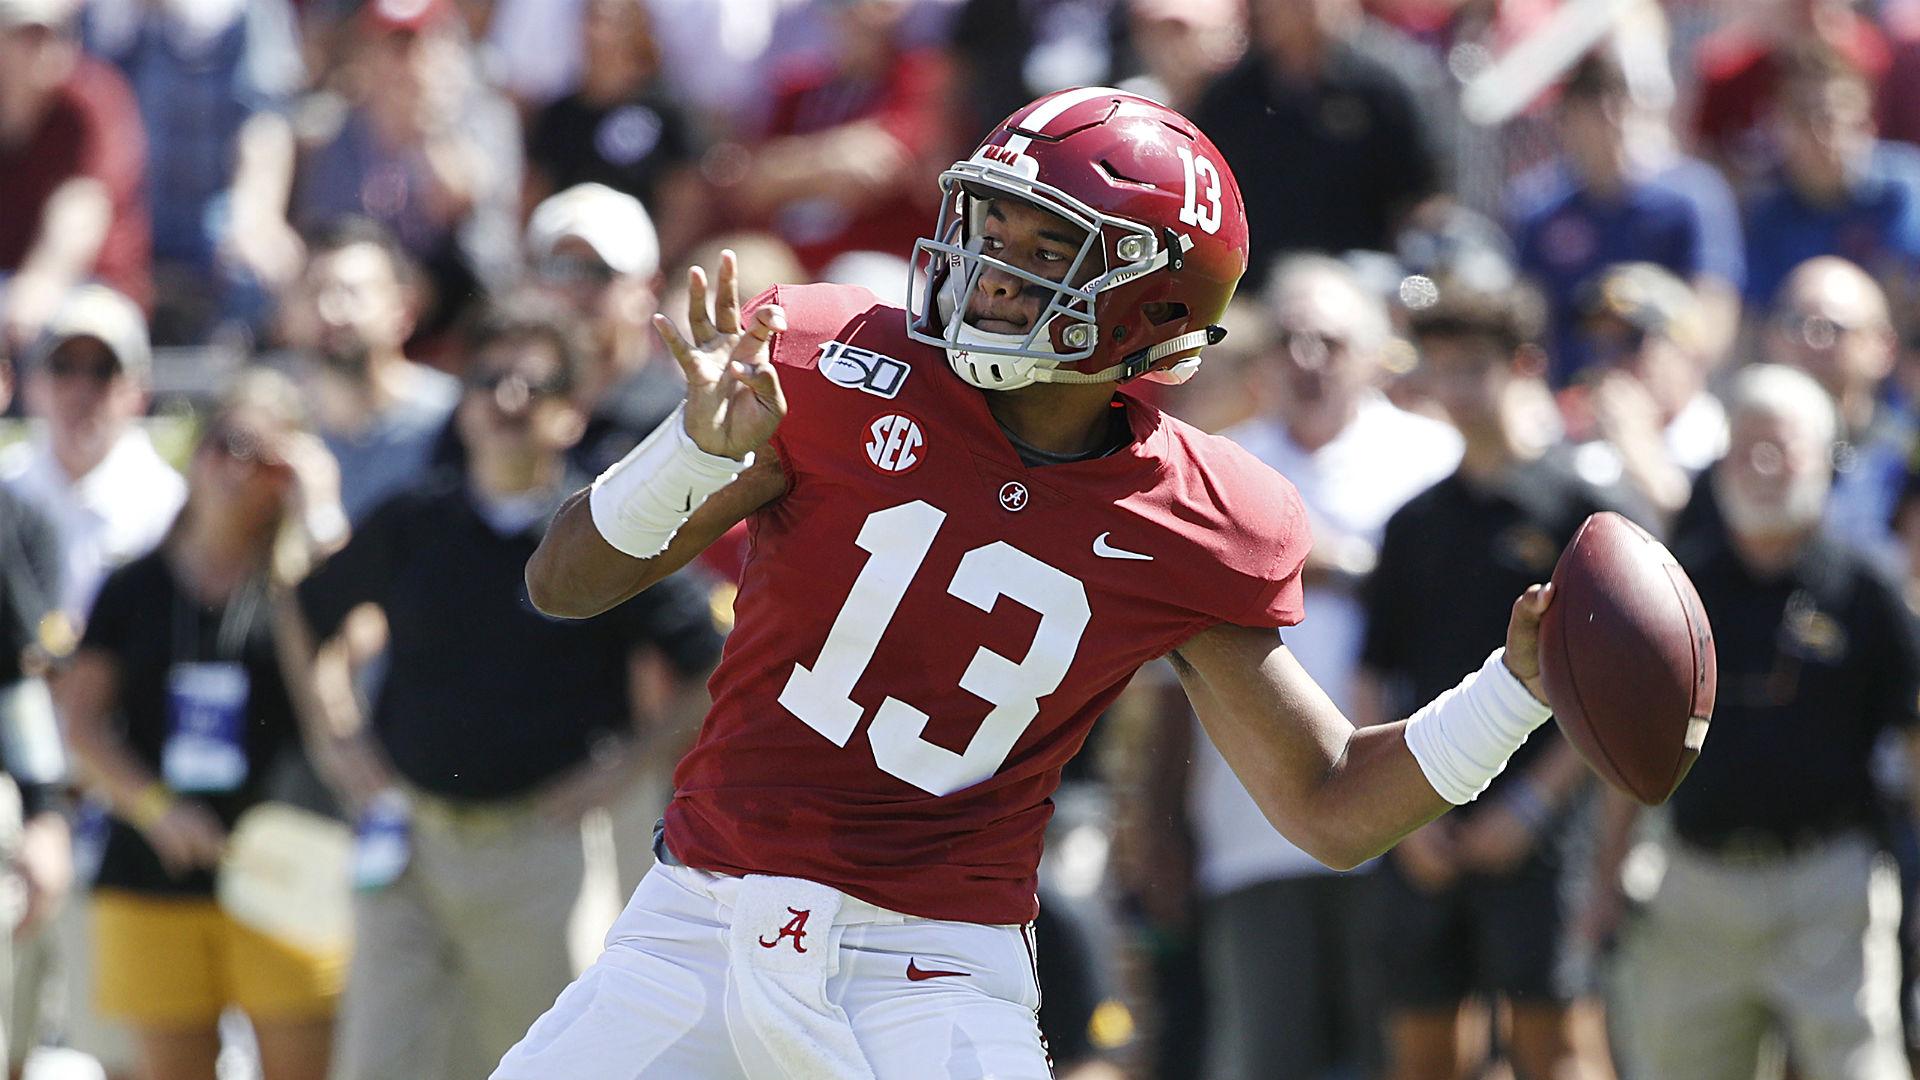 College football Week 8 primer: Heisman Watch, upset picks, predictions and more